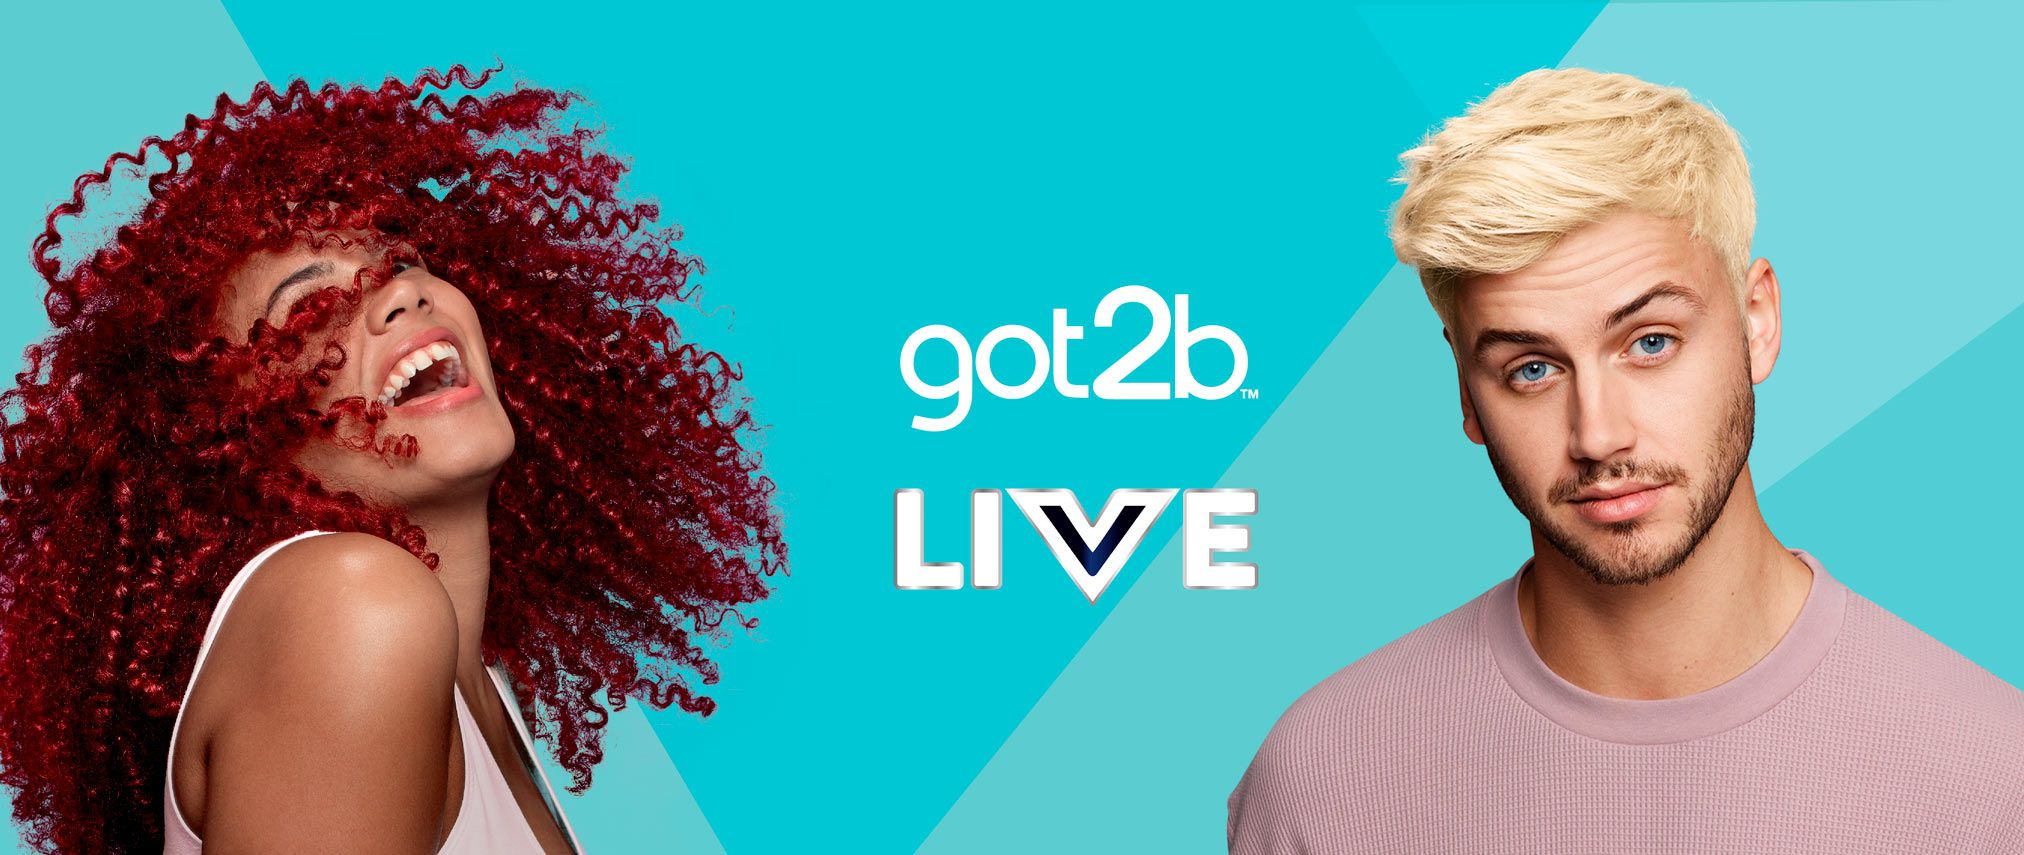 live got2b 2021